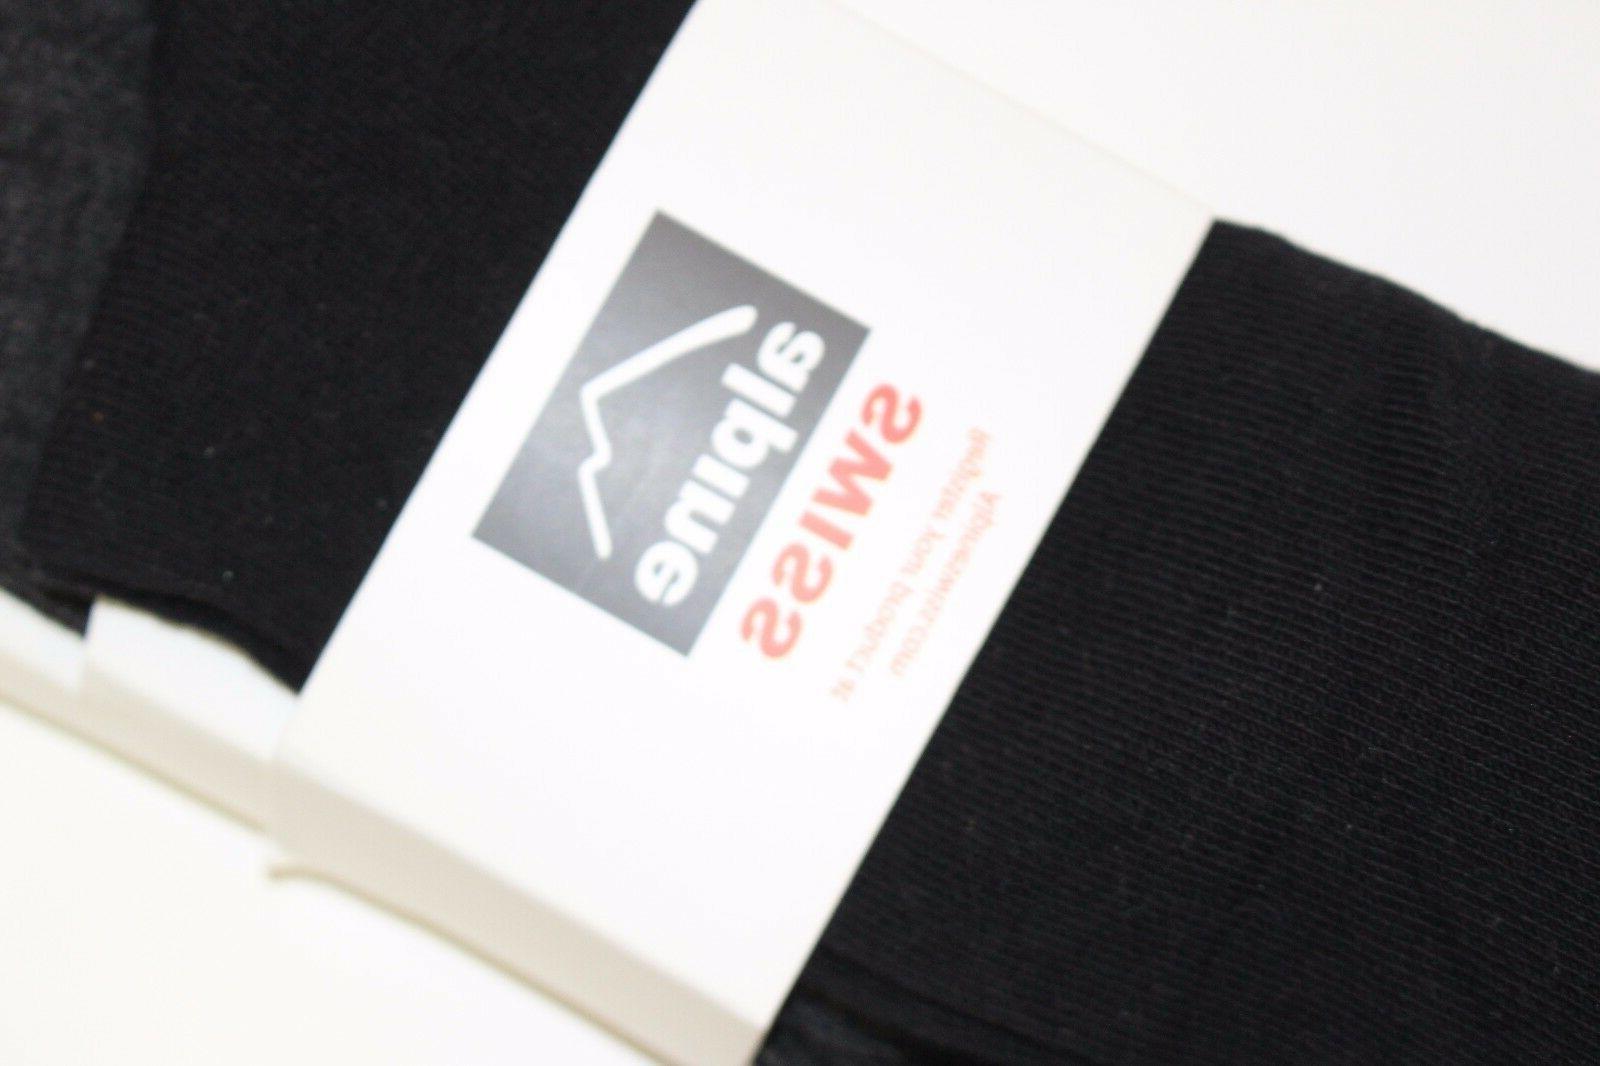 ALPINE SWISS PACK 10-12 BLACK CHARCOAL